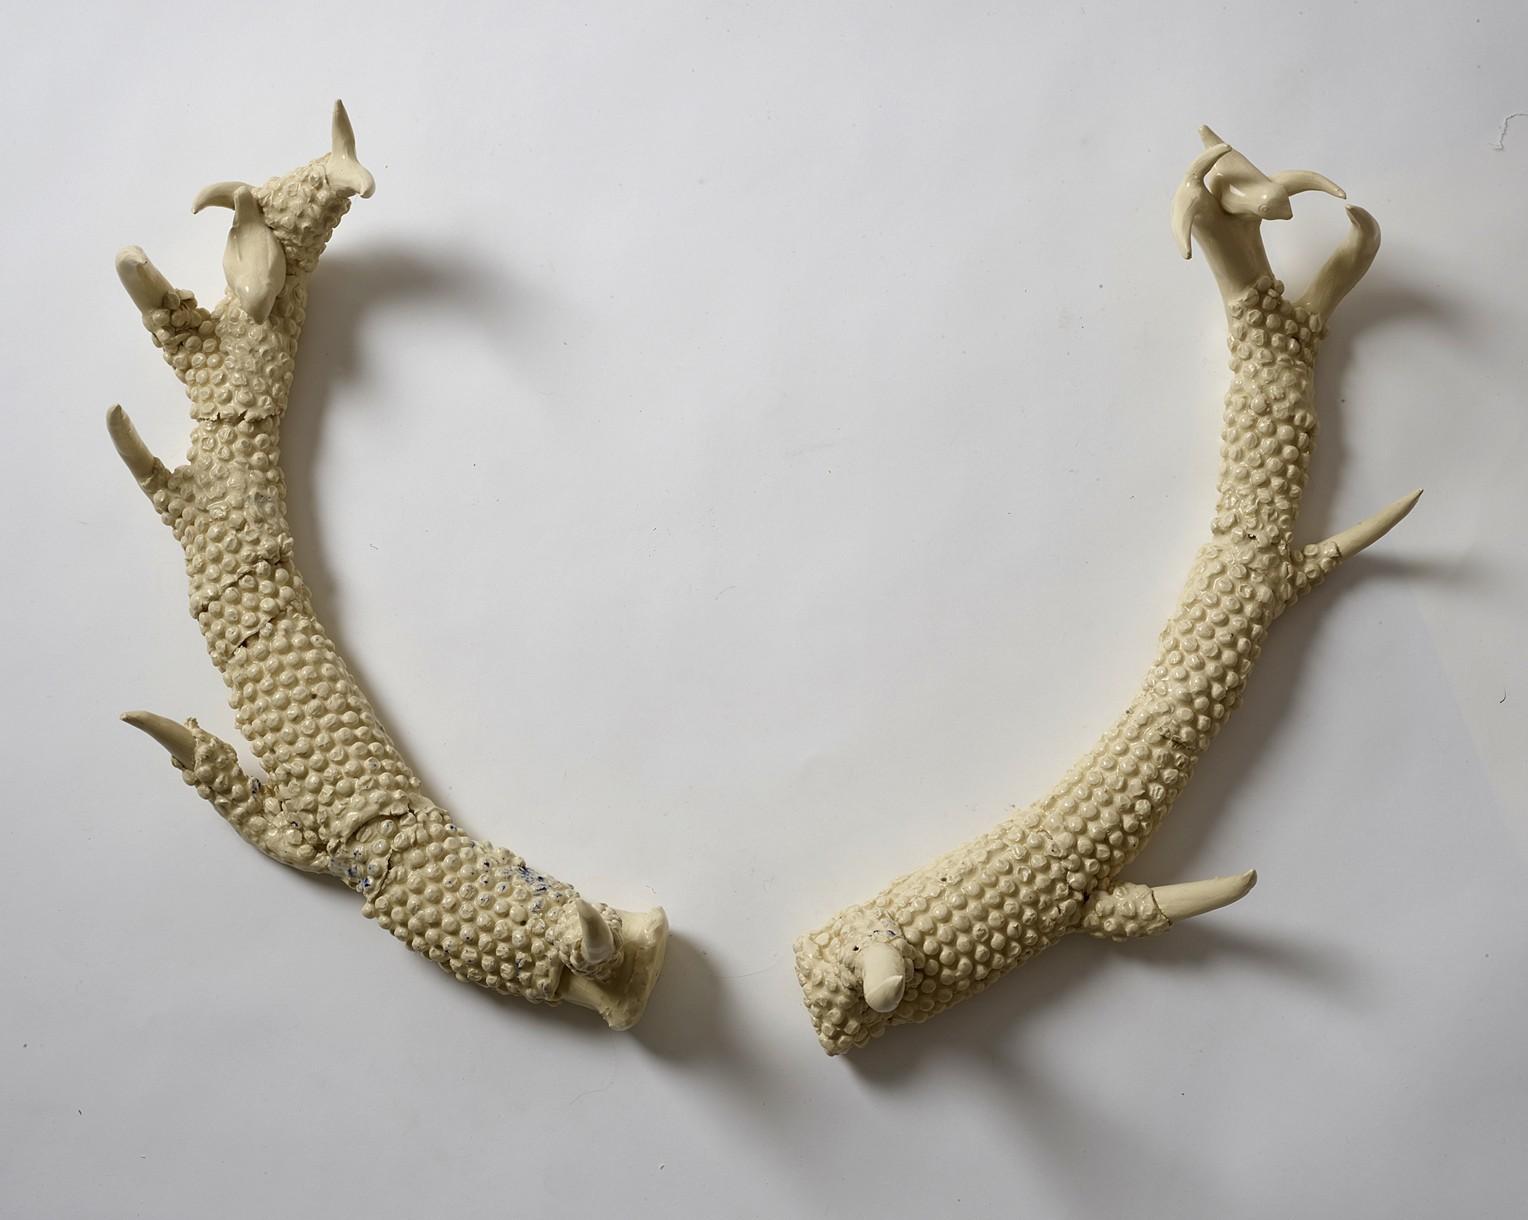 Untitled (Antlers)